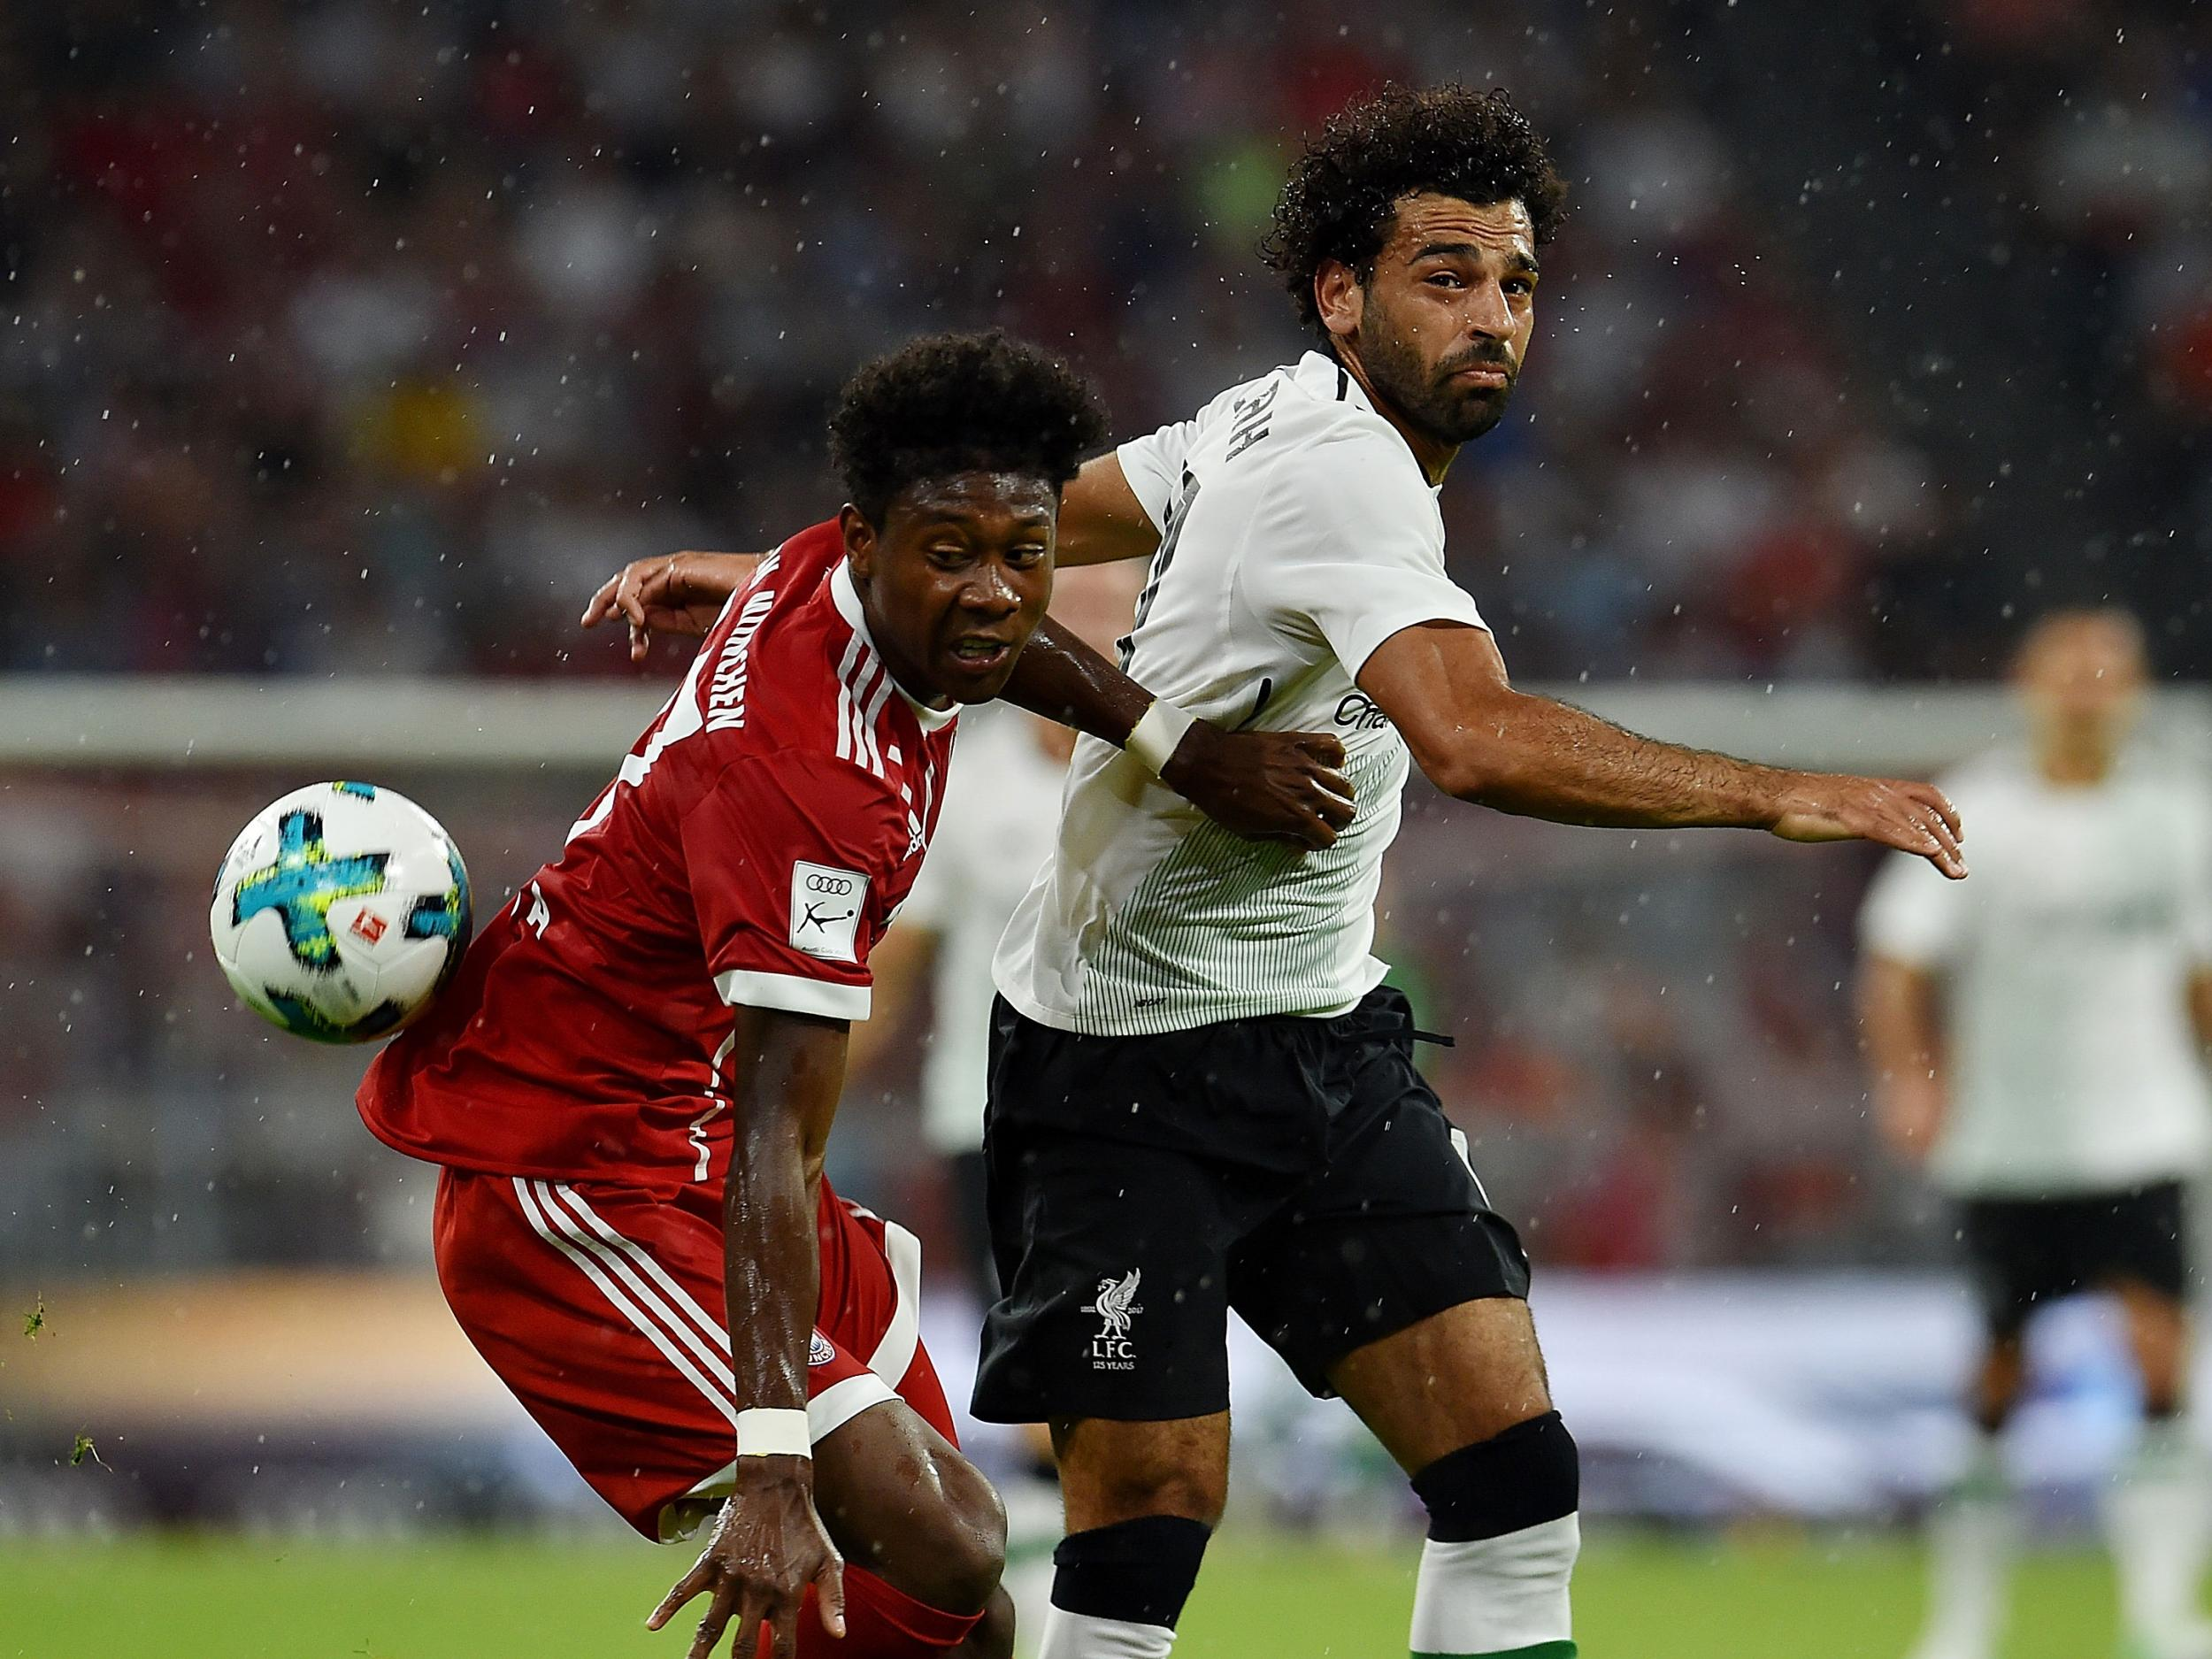 Jurgen Klopp hails important new signing Mohamed Salah after